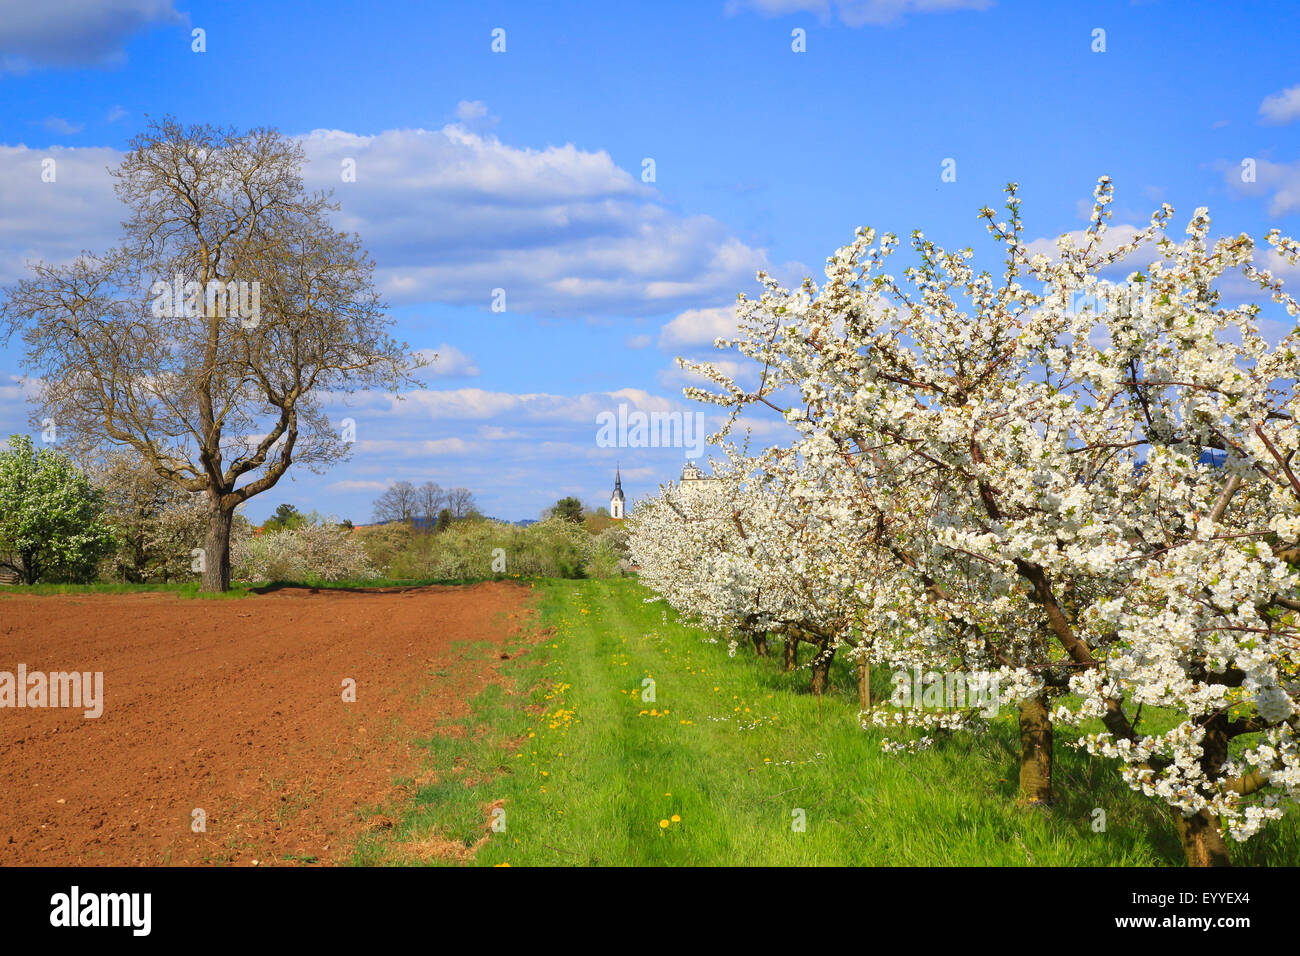 flowering cherry trees stock photos flowering cherry. Black Bedroom Furniture Sets. Home Design Ideas